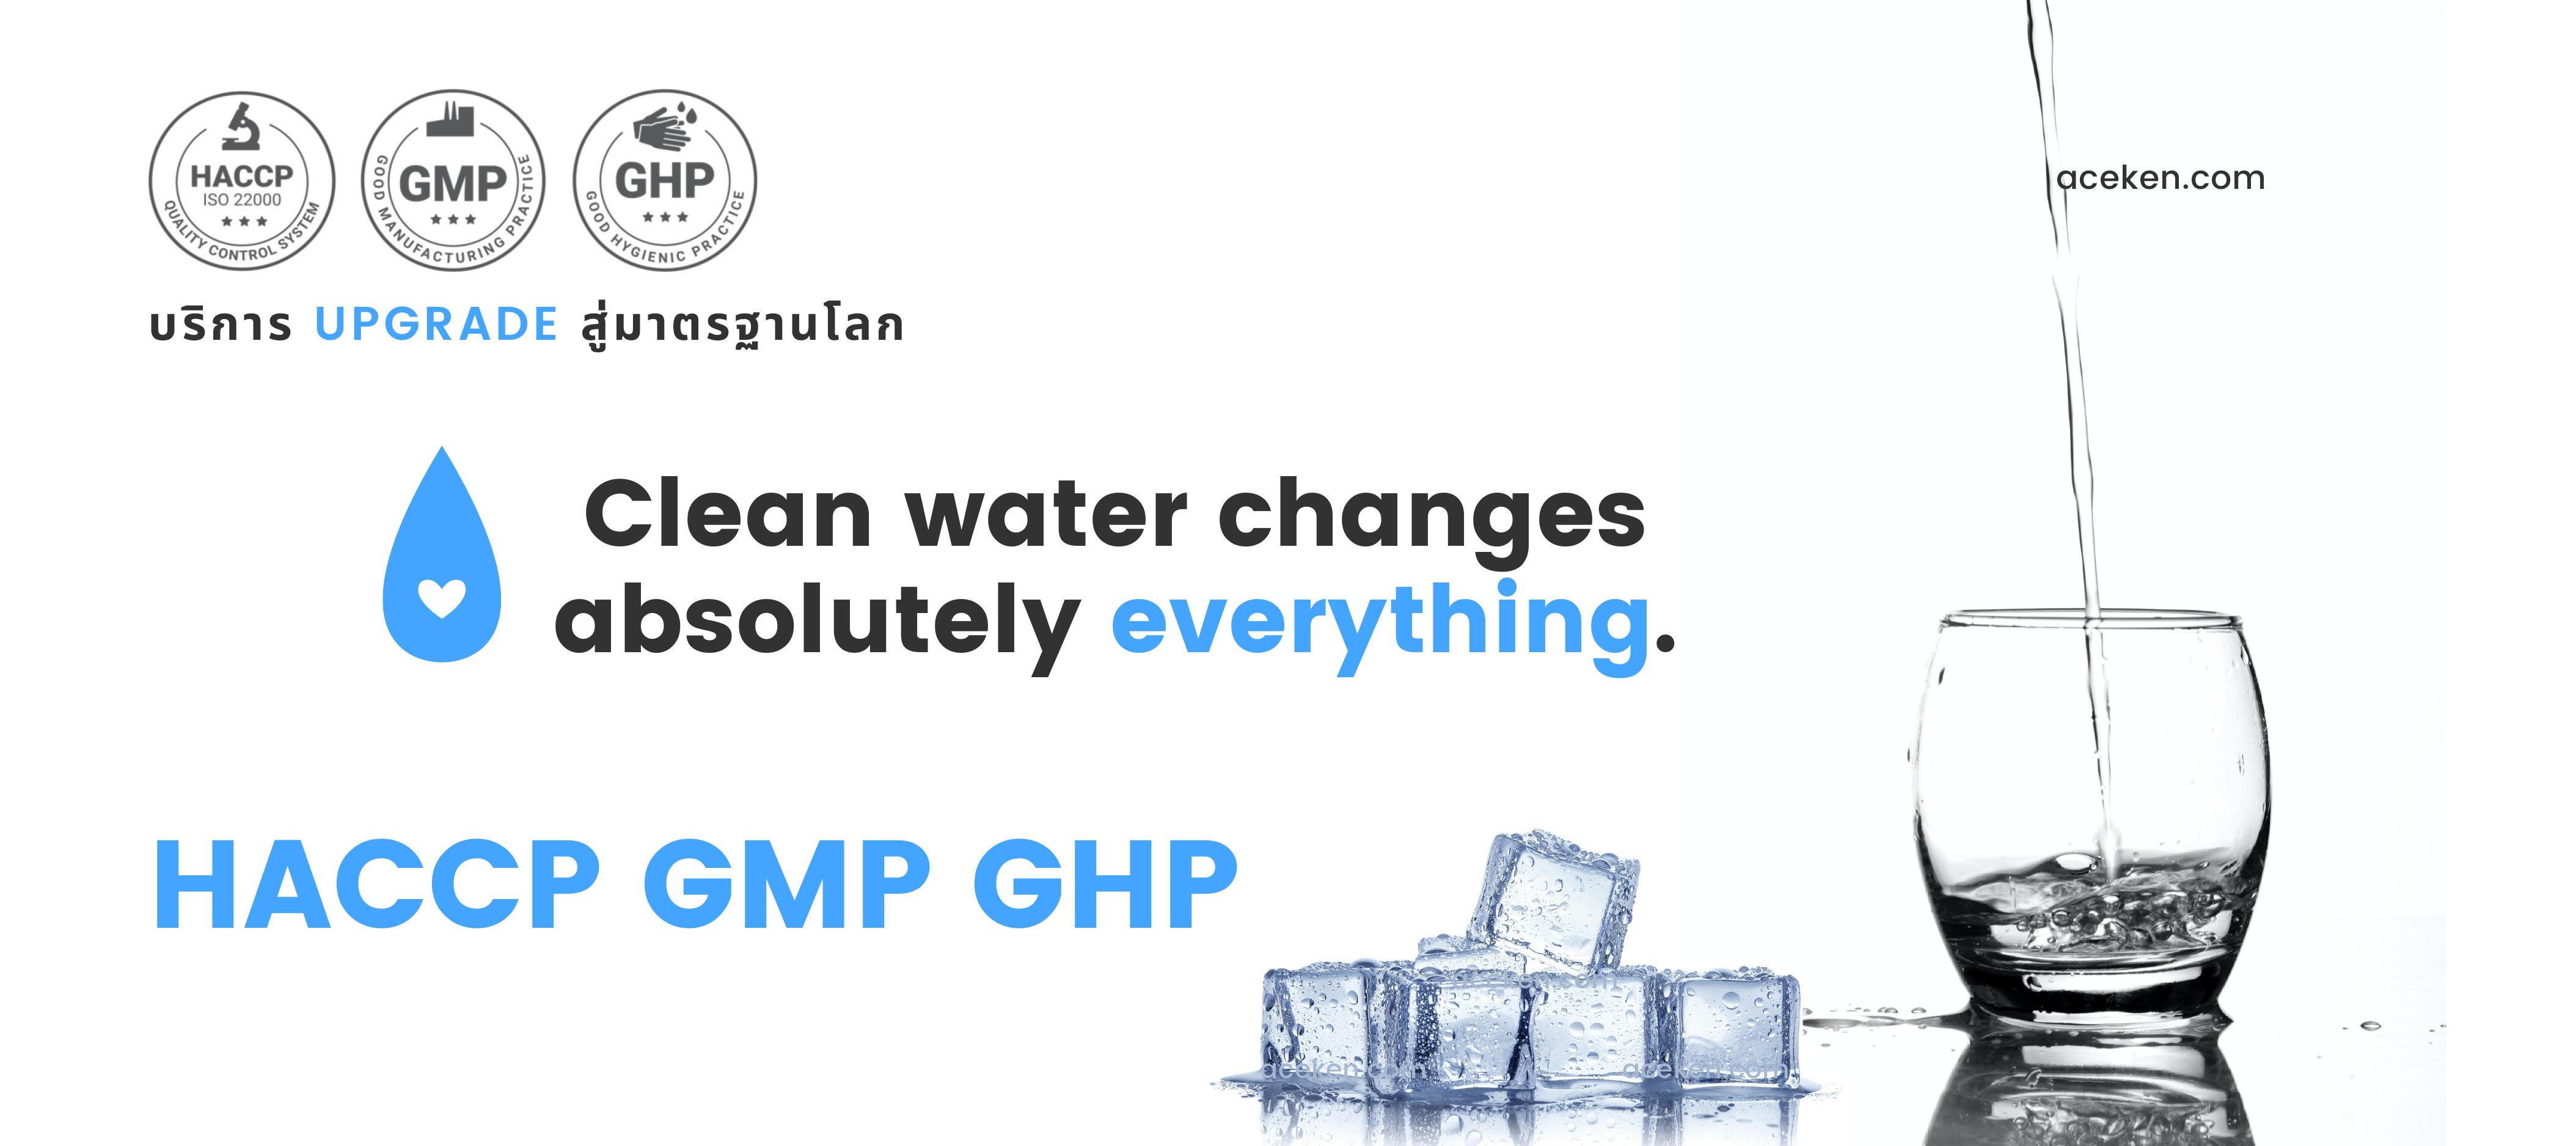 ace_HACCP_GMP_GHP_4216_1875